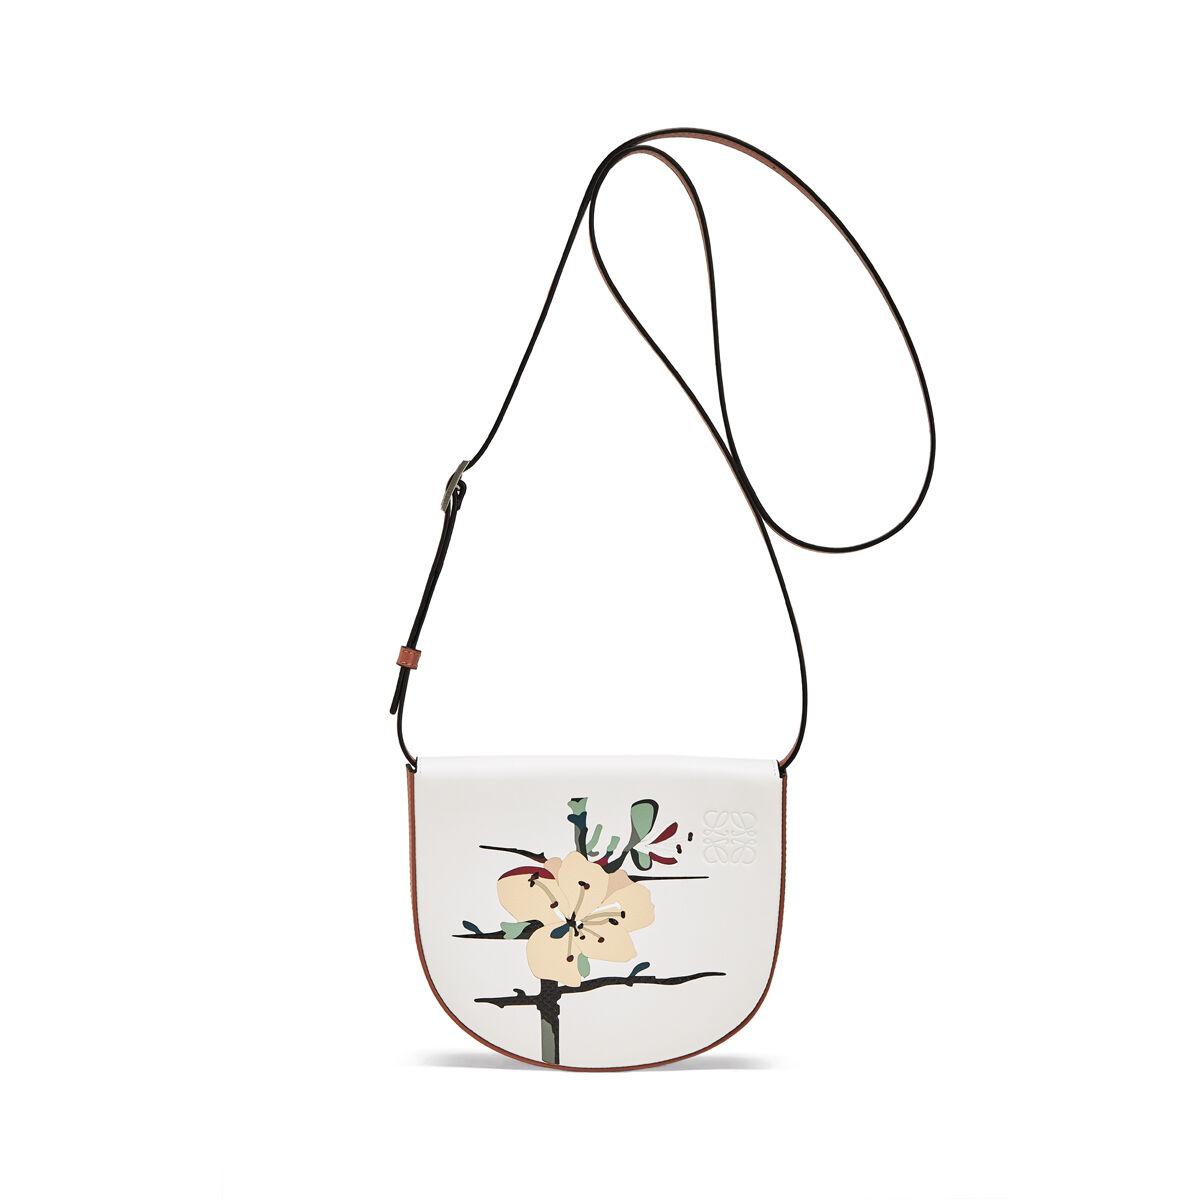 LOEWE Heel Mini Bag  Botanical Soft White/Tan all